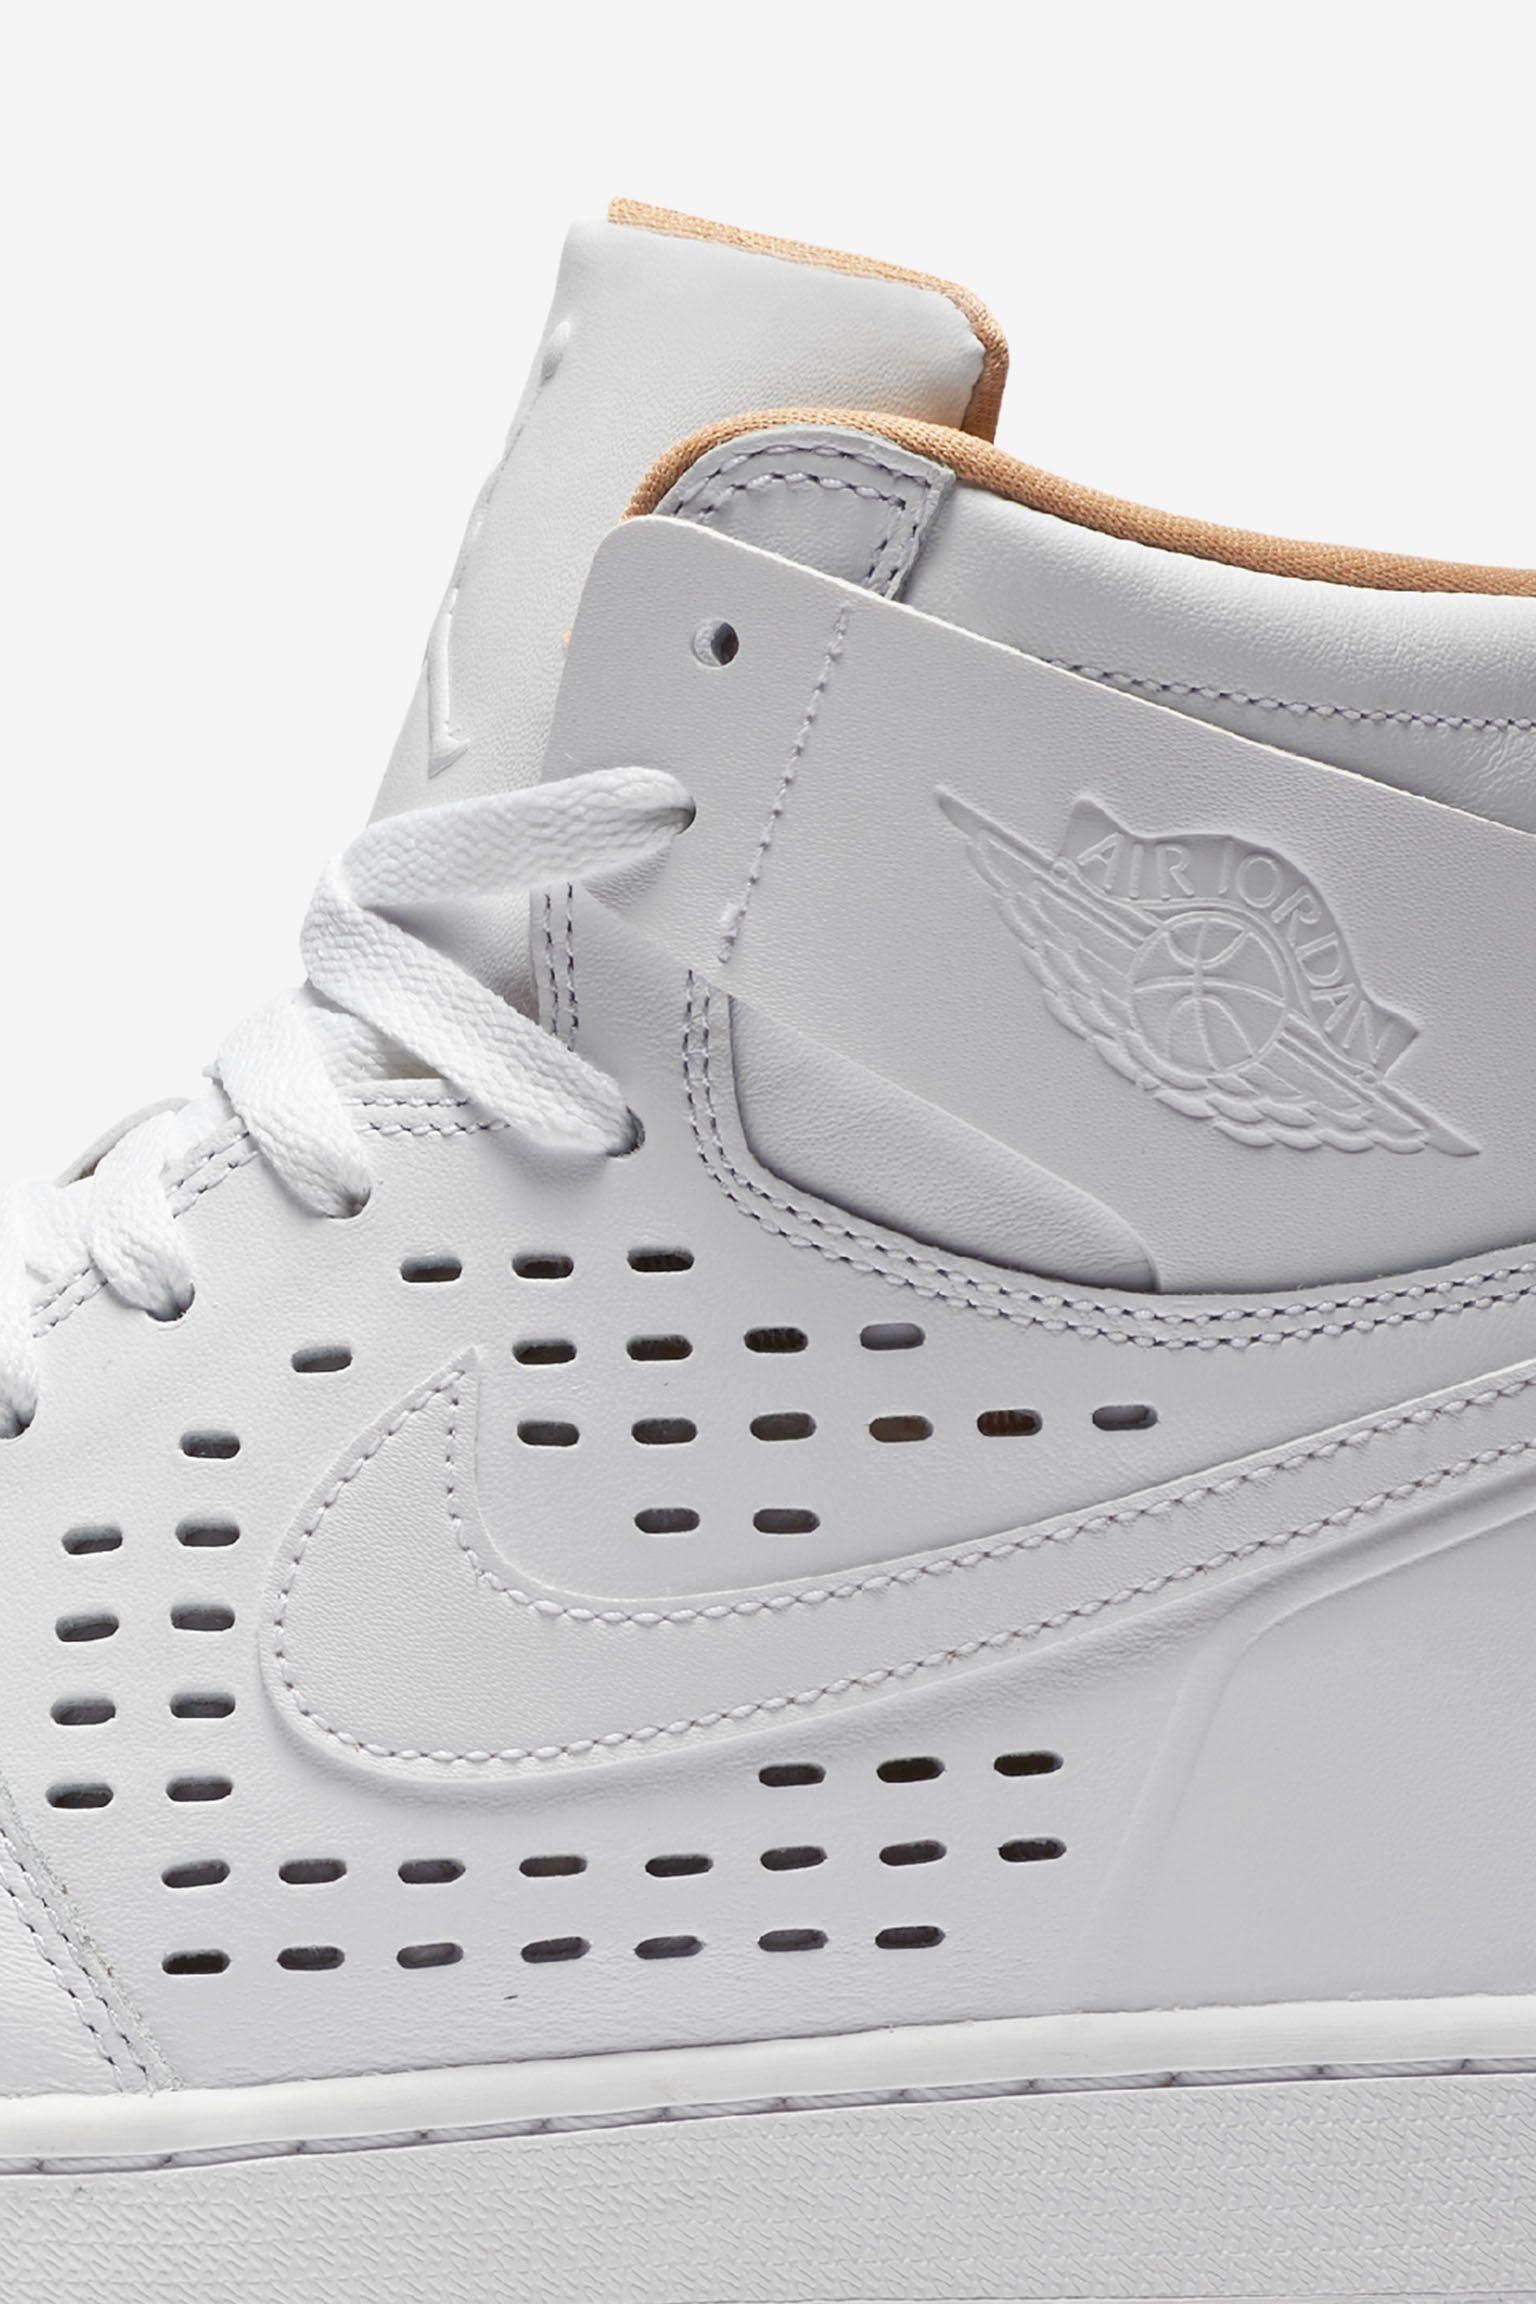 Air Jordan 1 Retro 'Engineered Perf' White Release Date